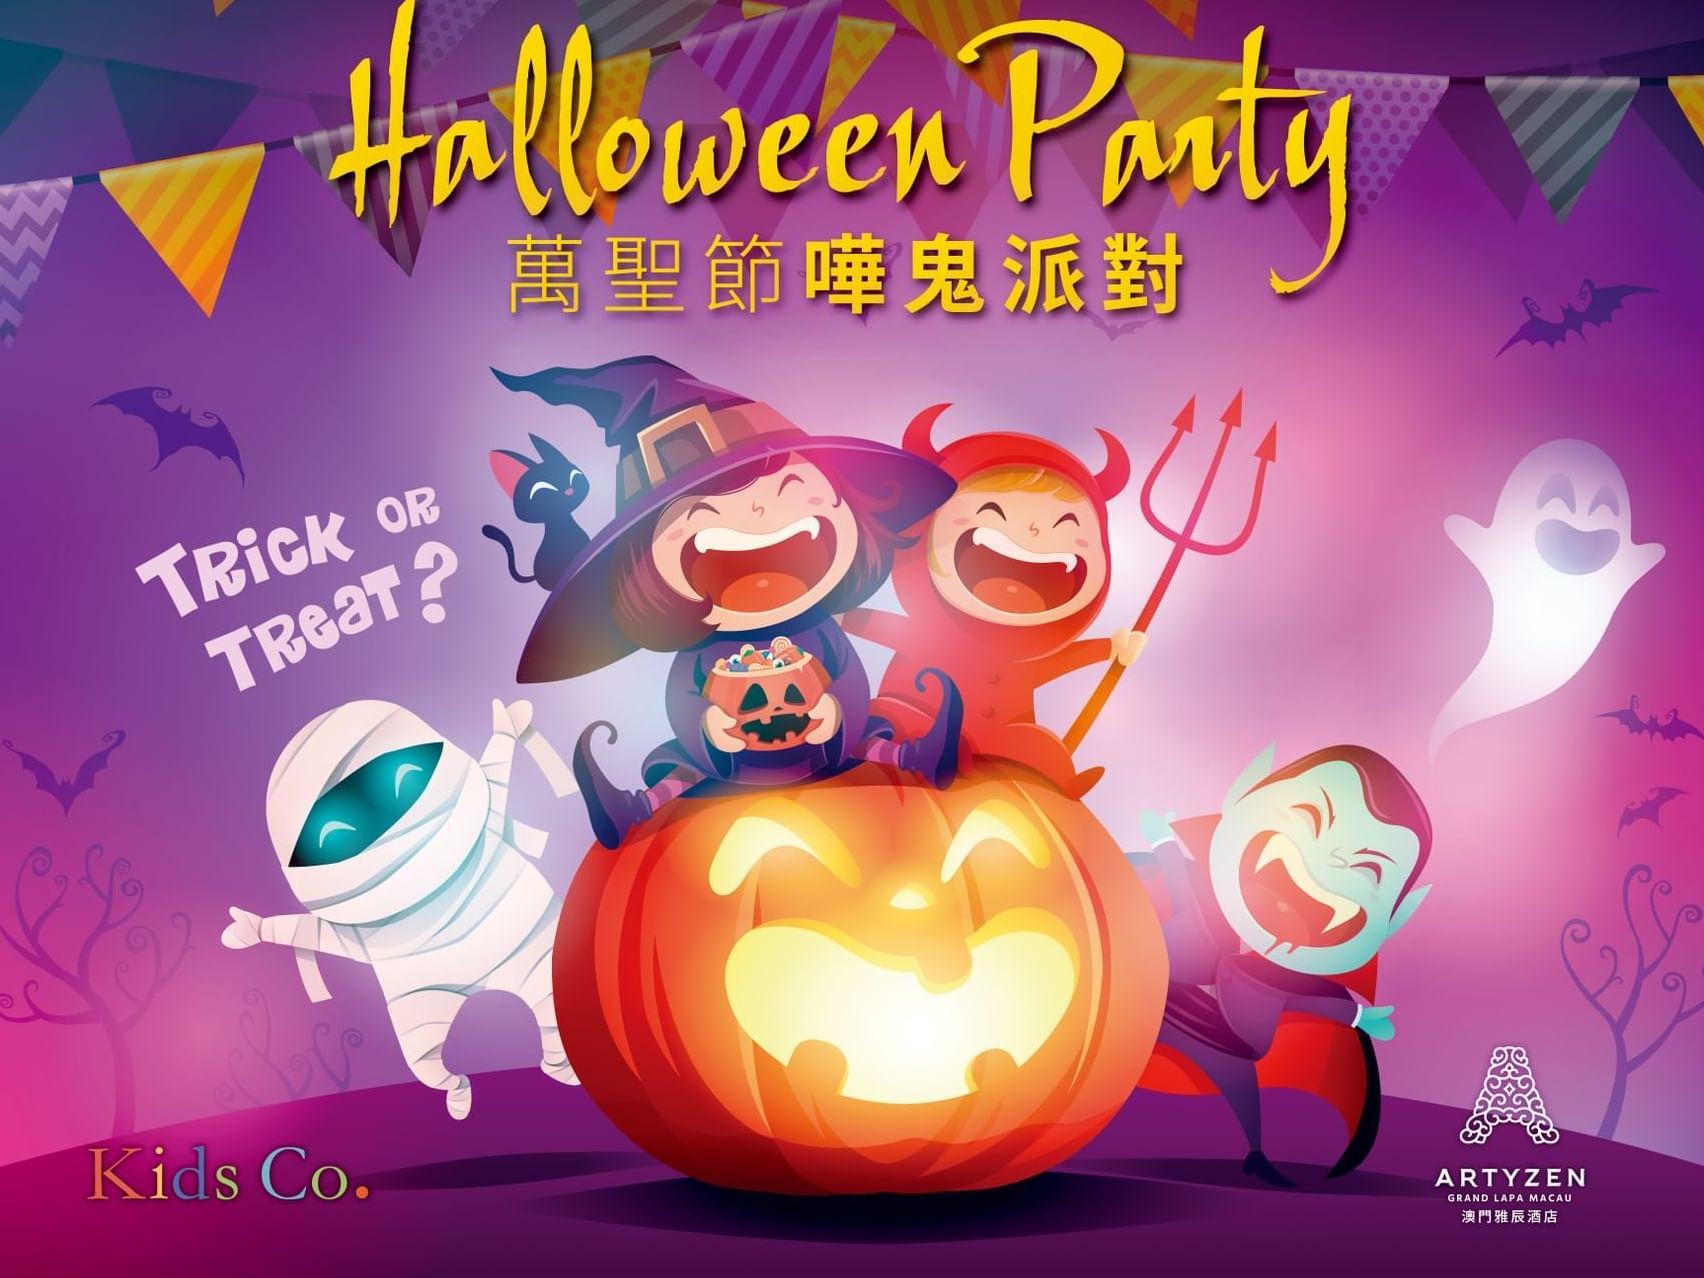 Post of Halloween Party of Artyzen Grand Lapa Hotel